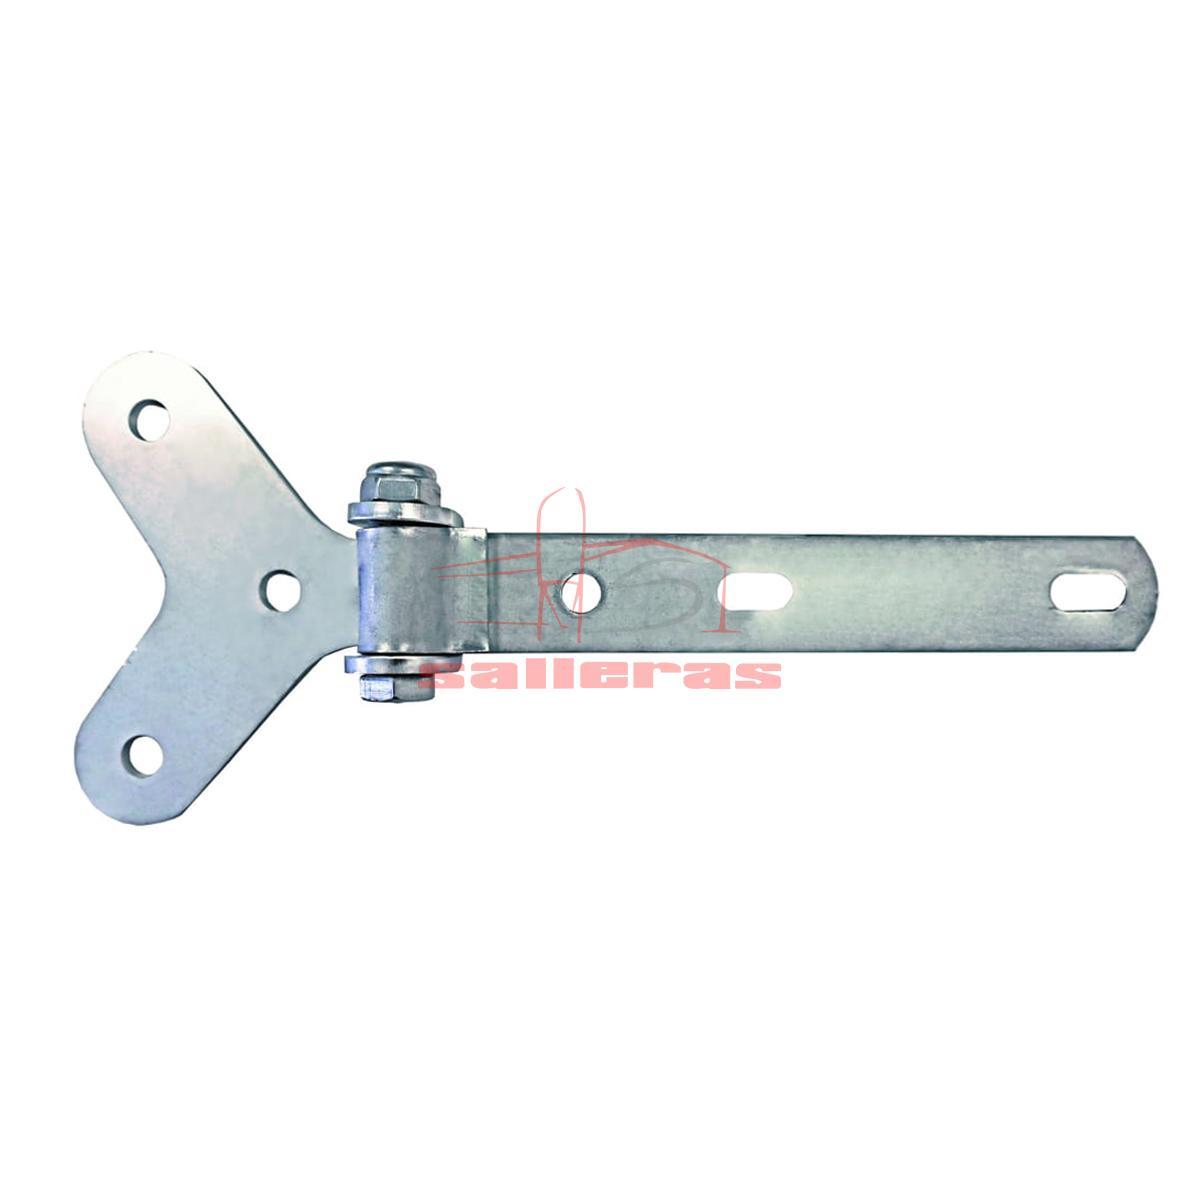 Bisagra de poliester de acero inoxidable para puertas